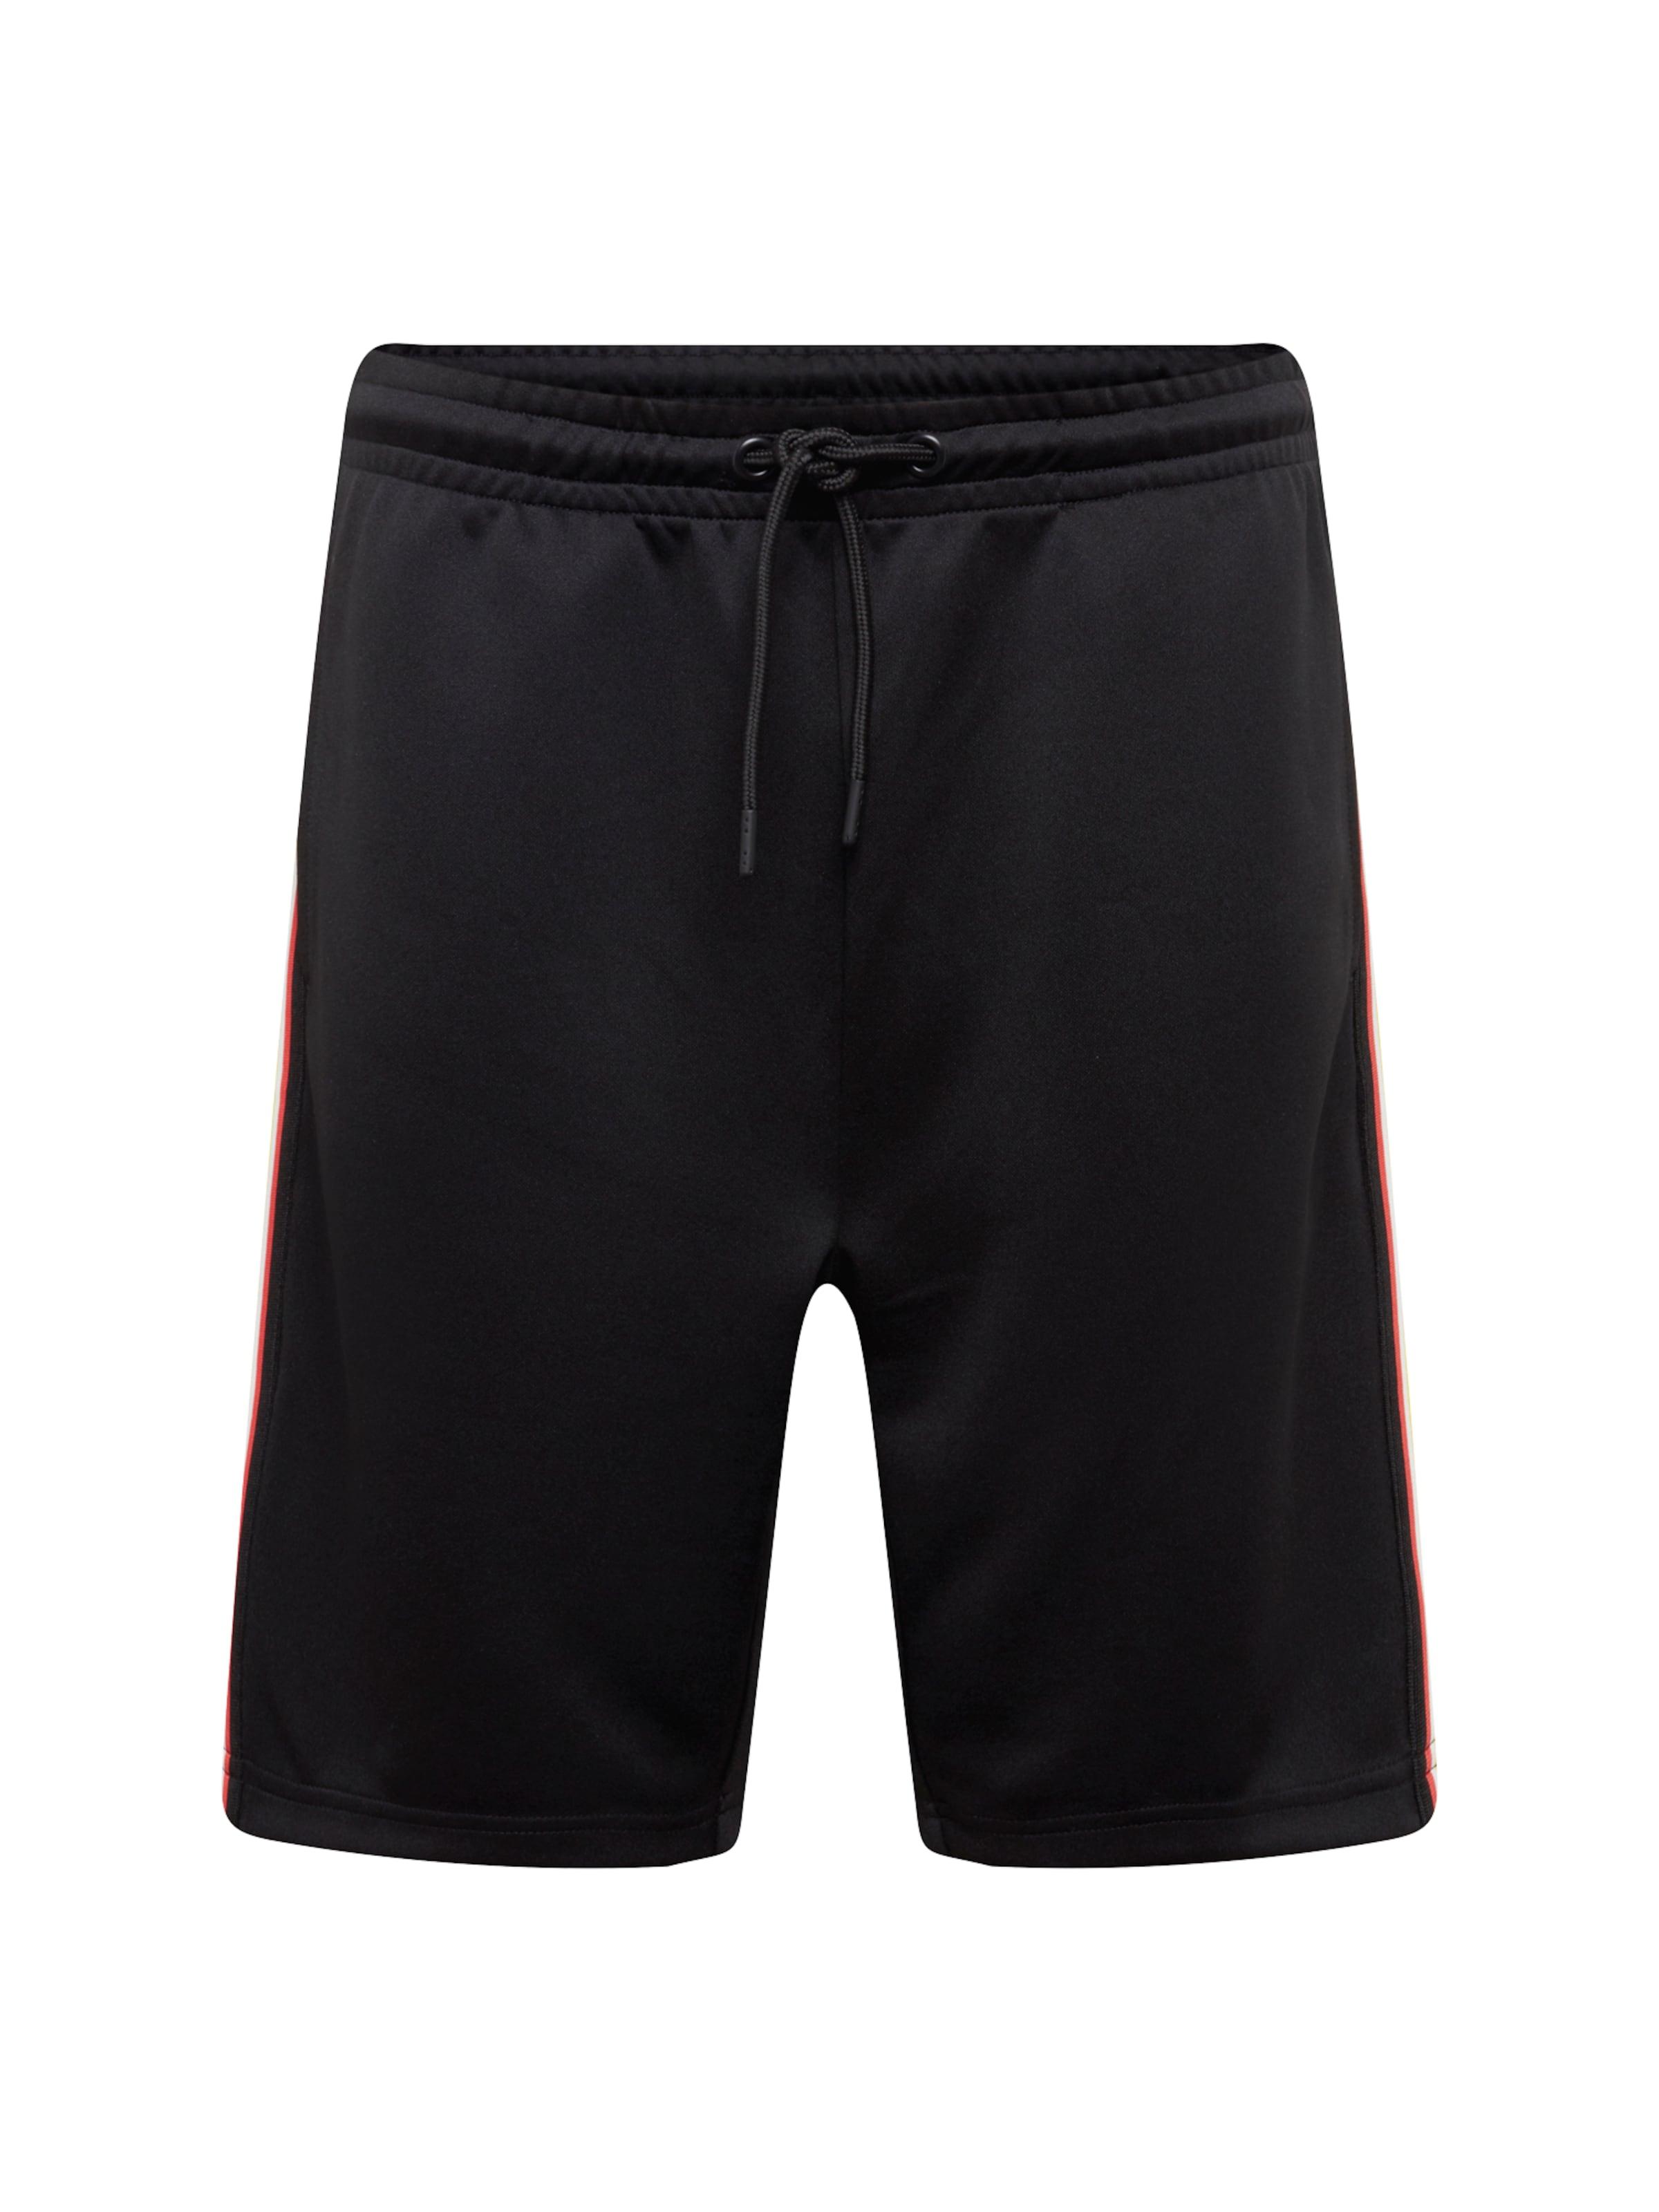 Pantalon Classics Shorts' Urban Track 'side En Taped Noir x5H7wU